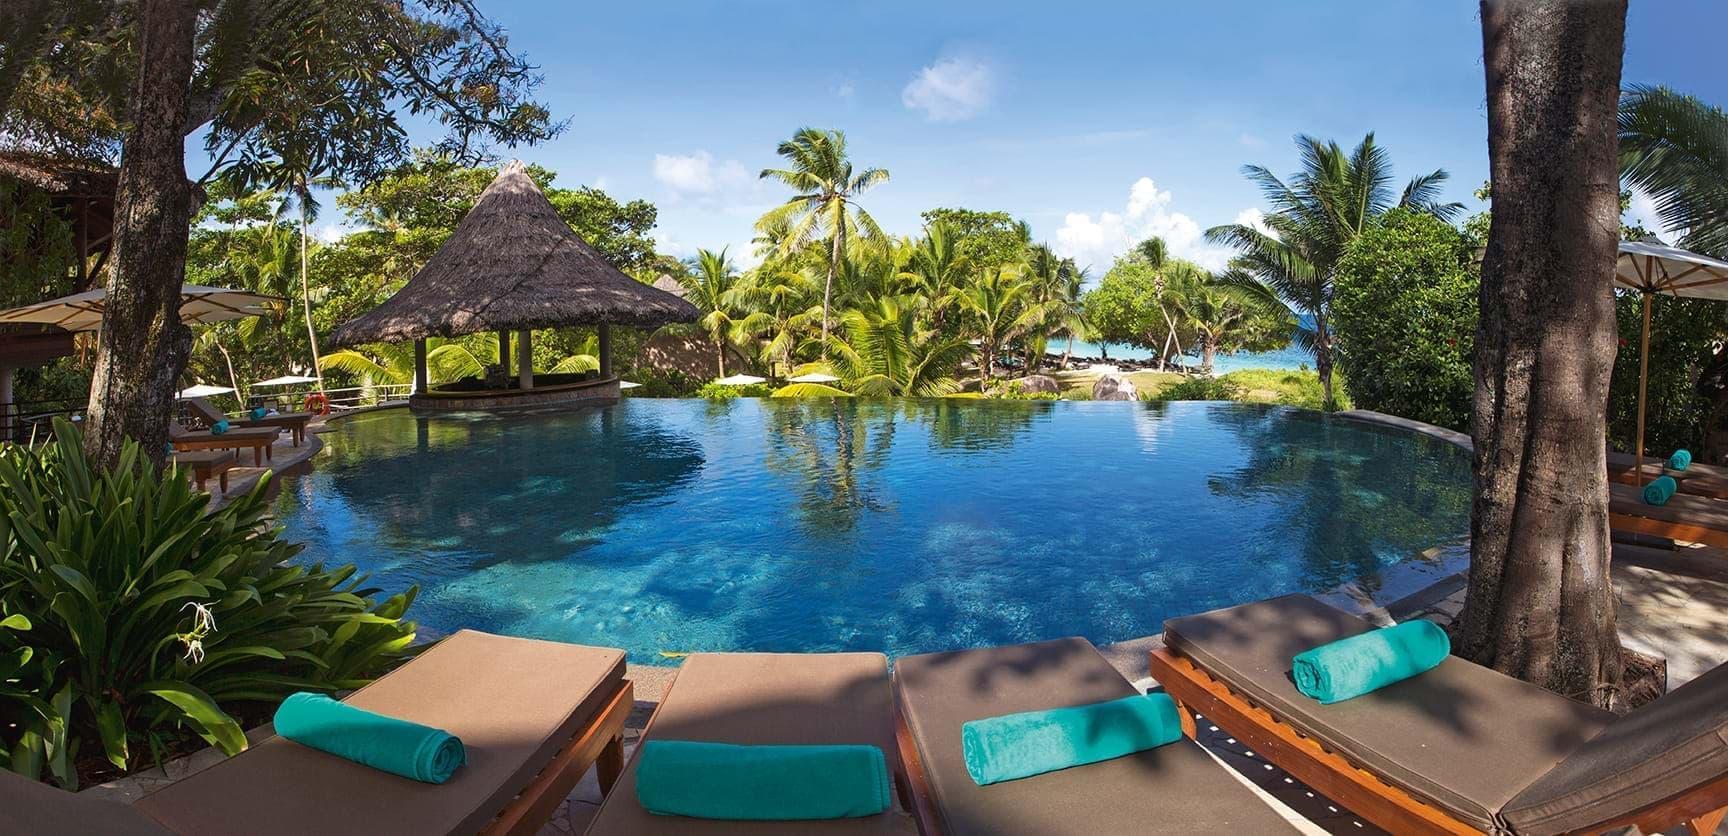 lemuria-seychelles-pool-view-11